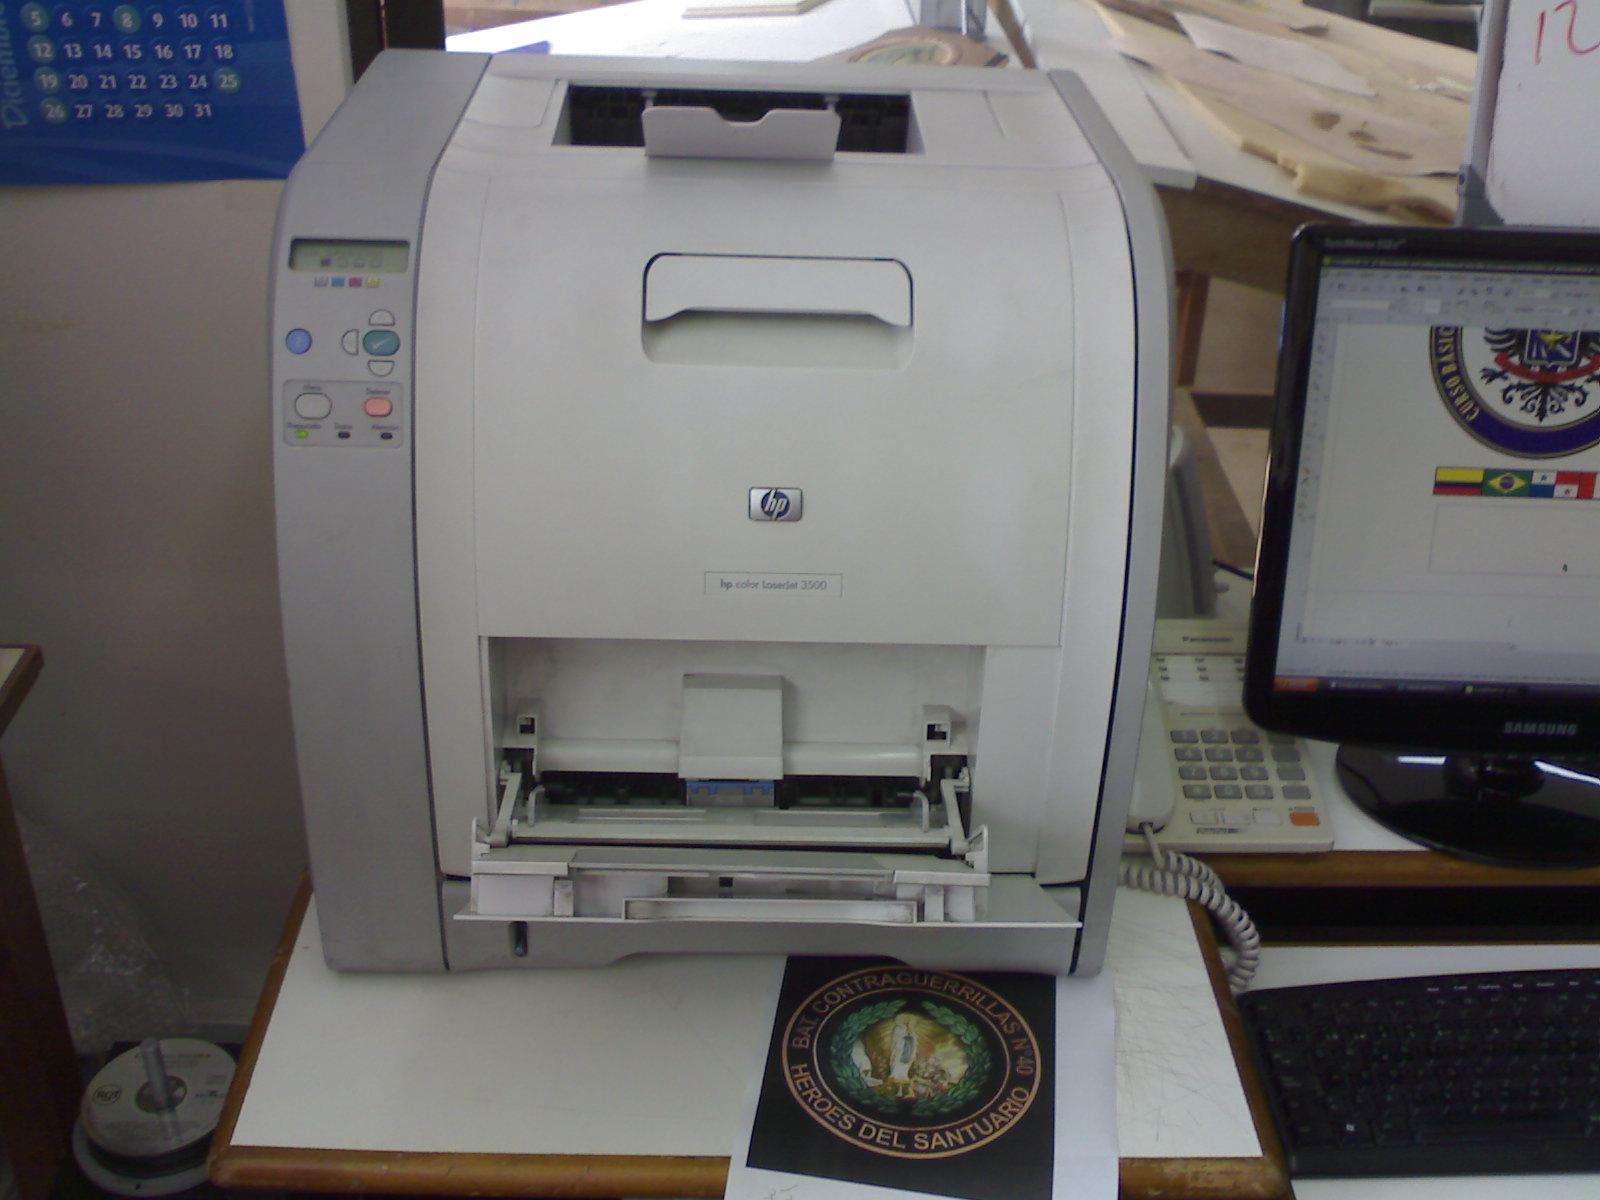 mantenimiento de portatiles e impresoras impresora laser hp laserjet 3200. Black Bedroom Furniture Sets. Home Design Ideas